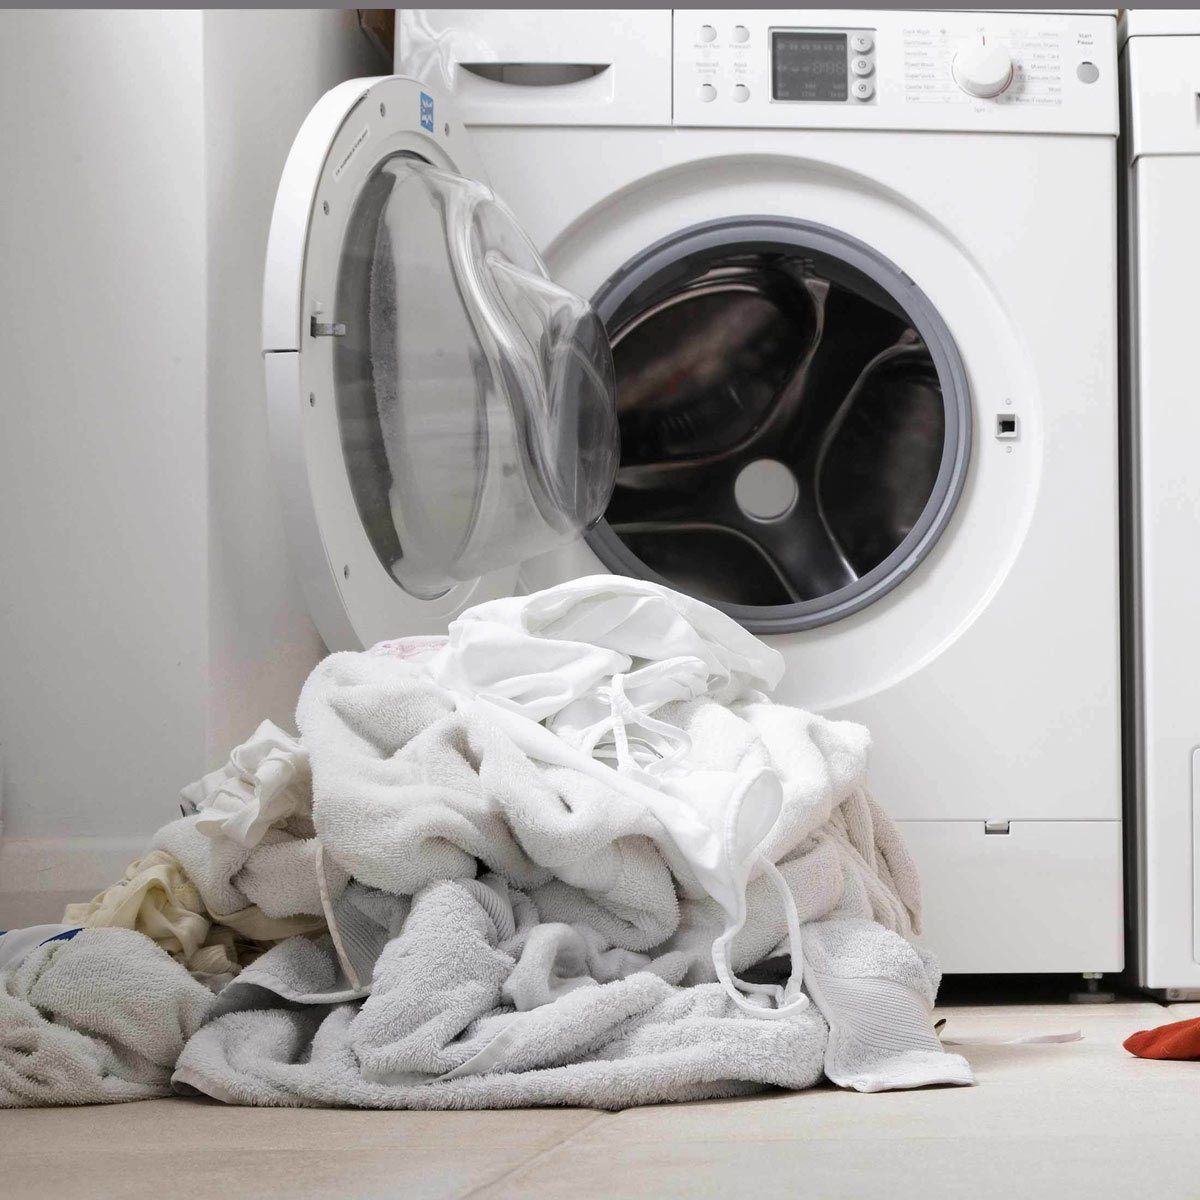 Laundry room washing machine pile of white clothes